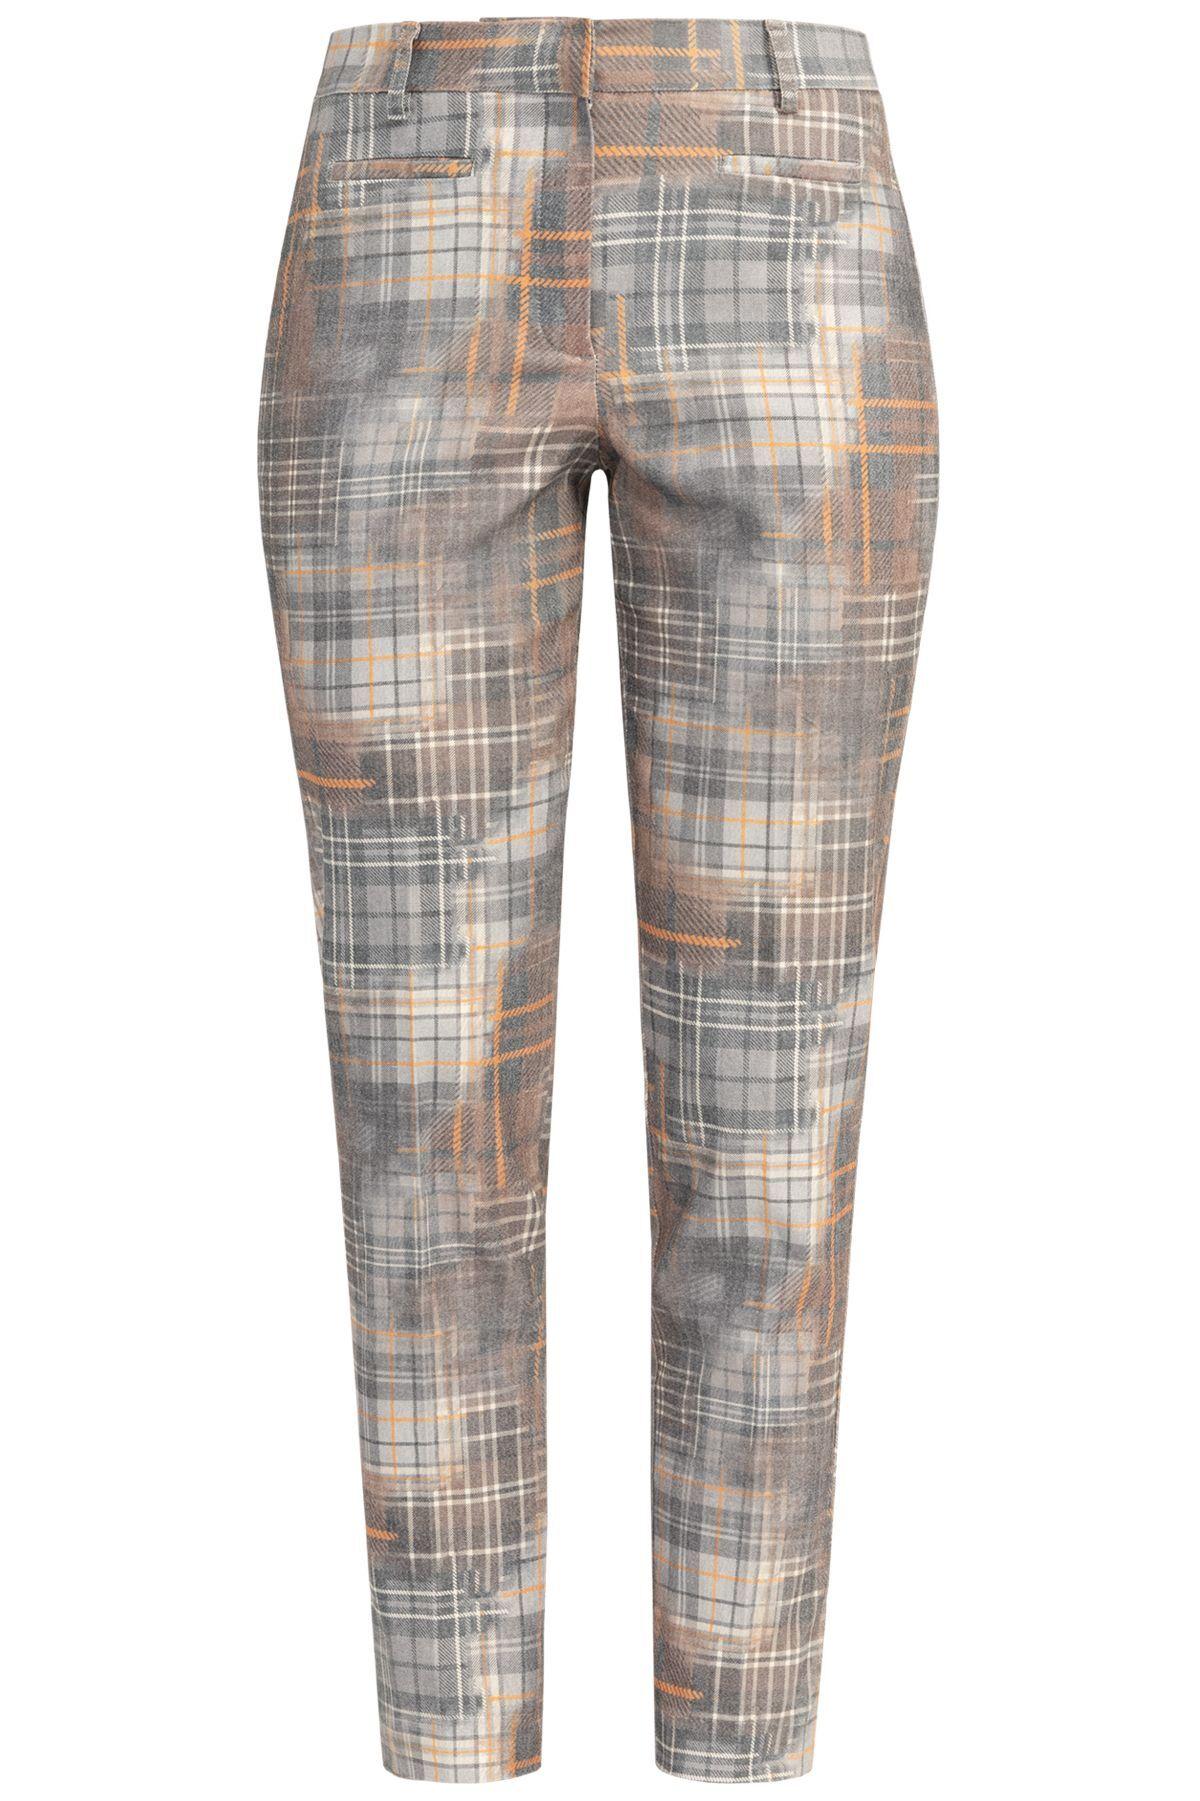 recover pants -  Stoffhose, mit Karodruck